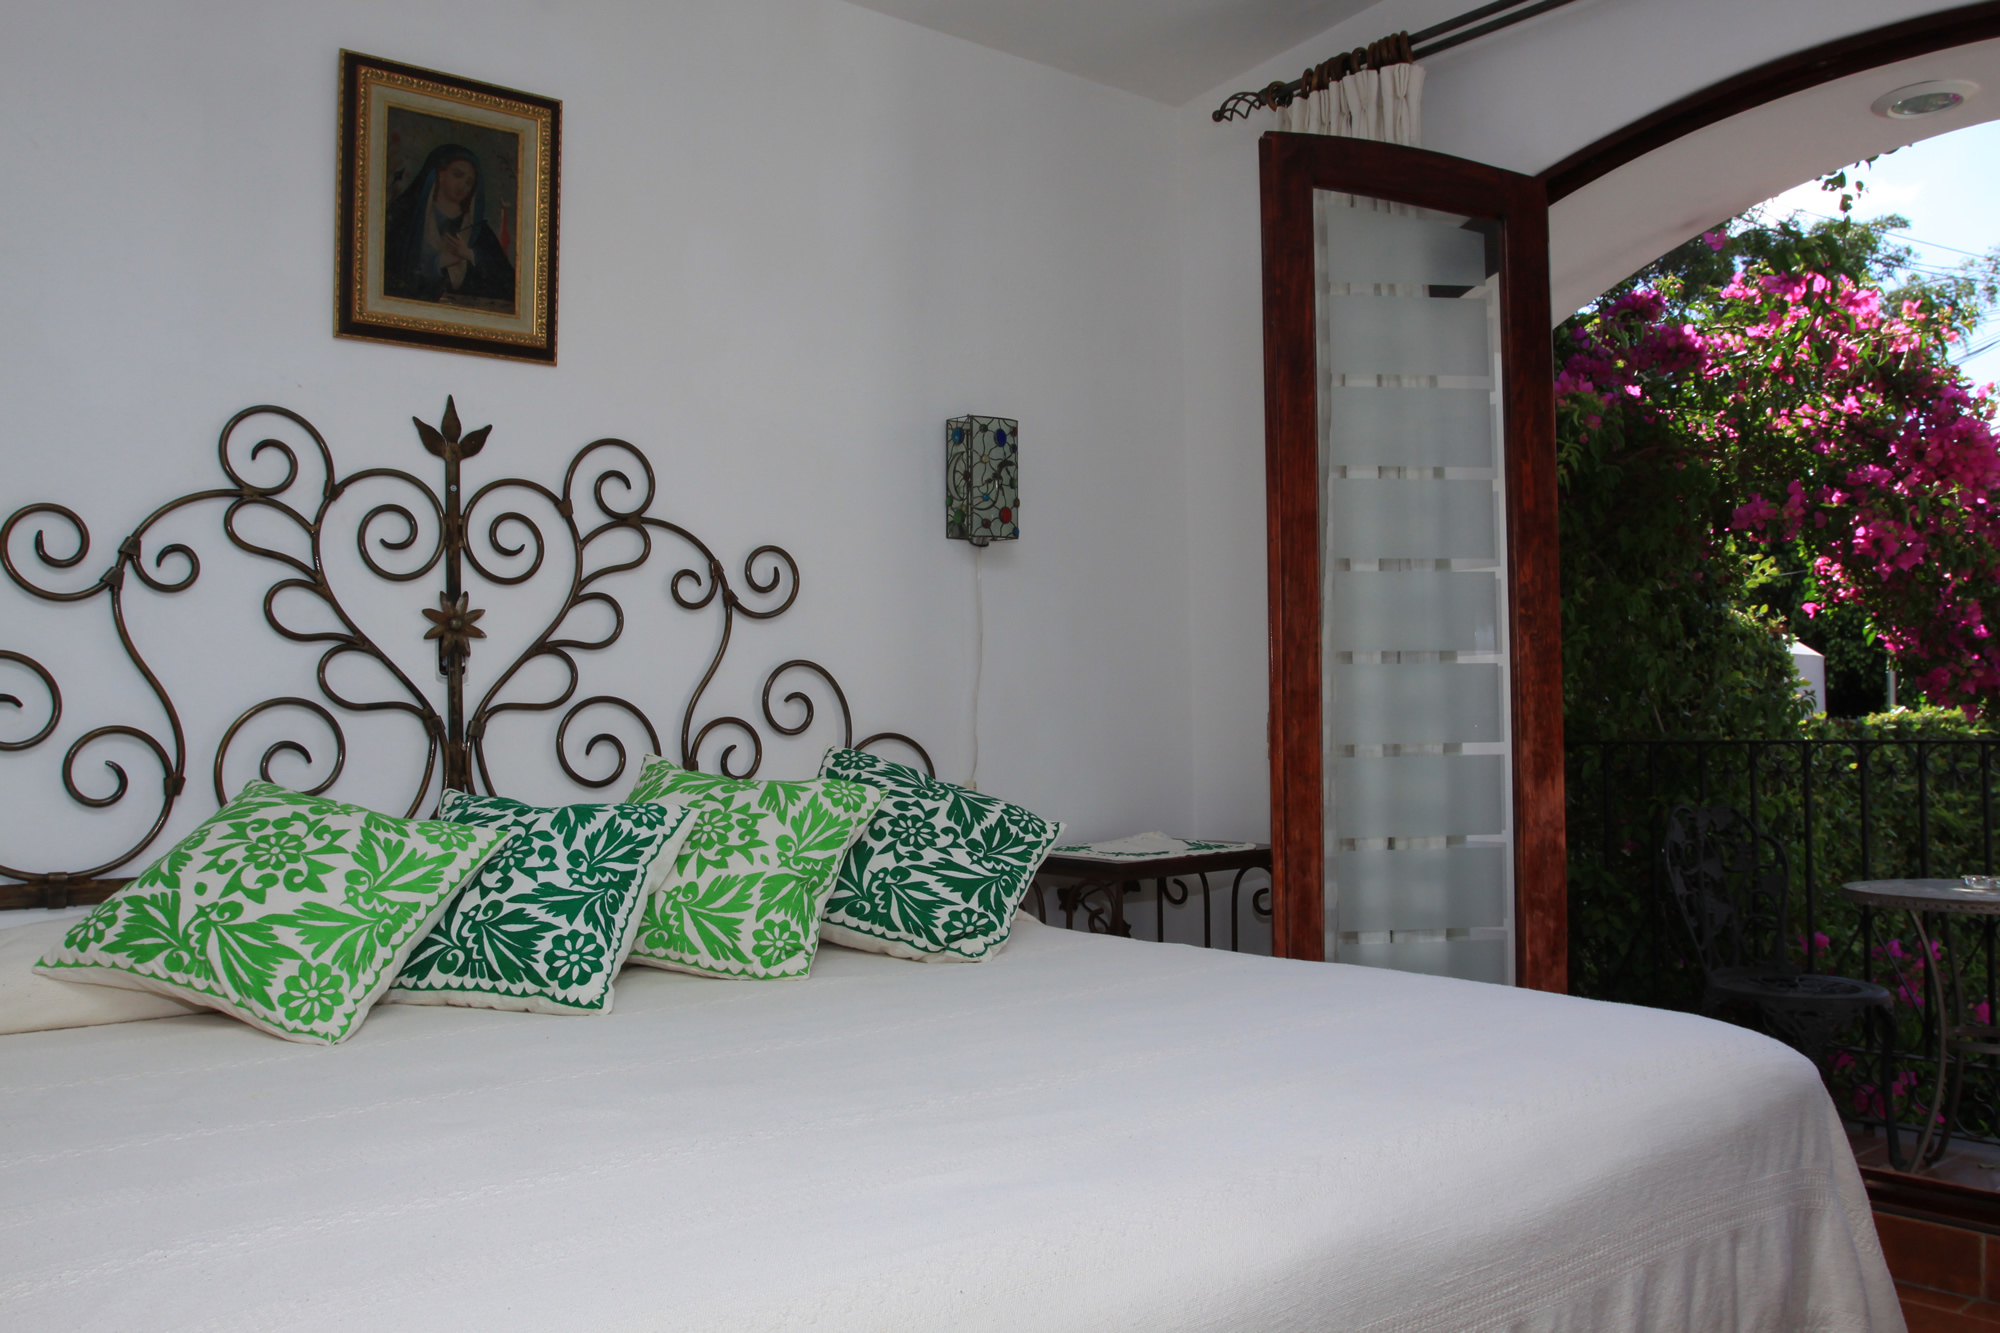 Bed And Breakfast Oaxaca Mx